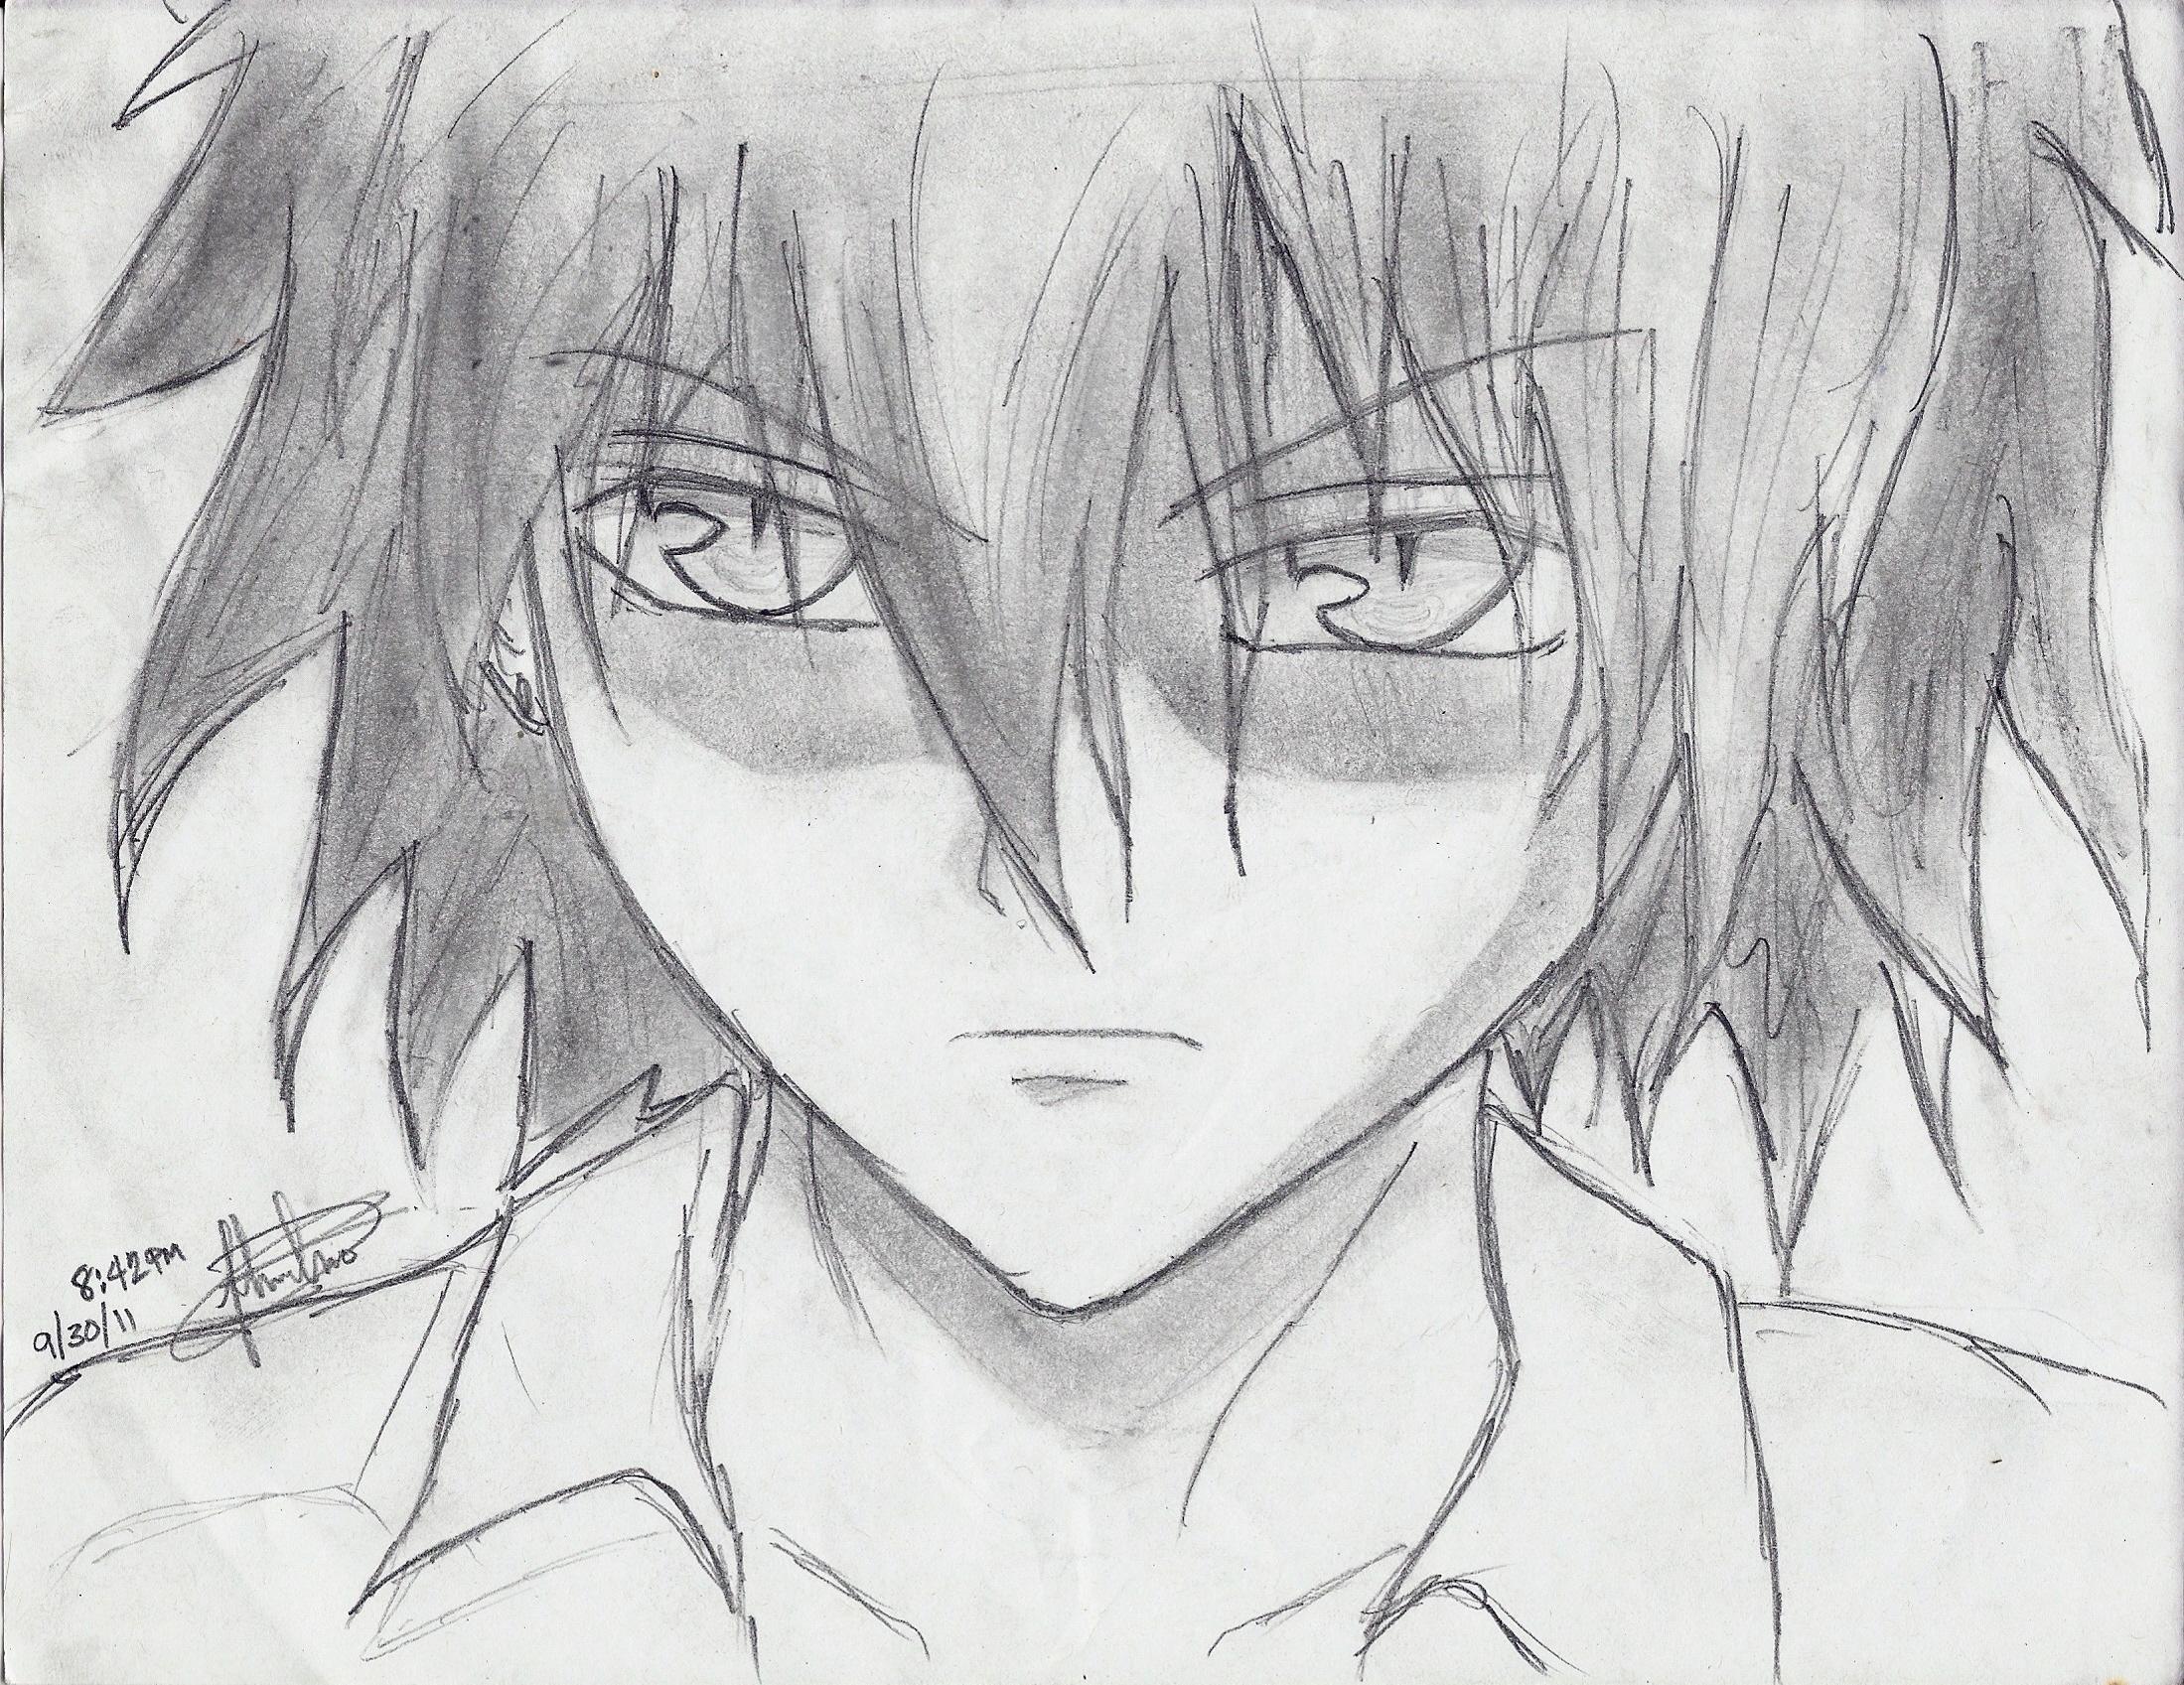 Image seo all 2 anime drawings